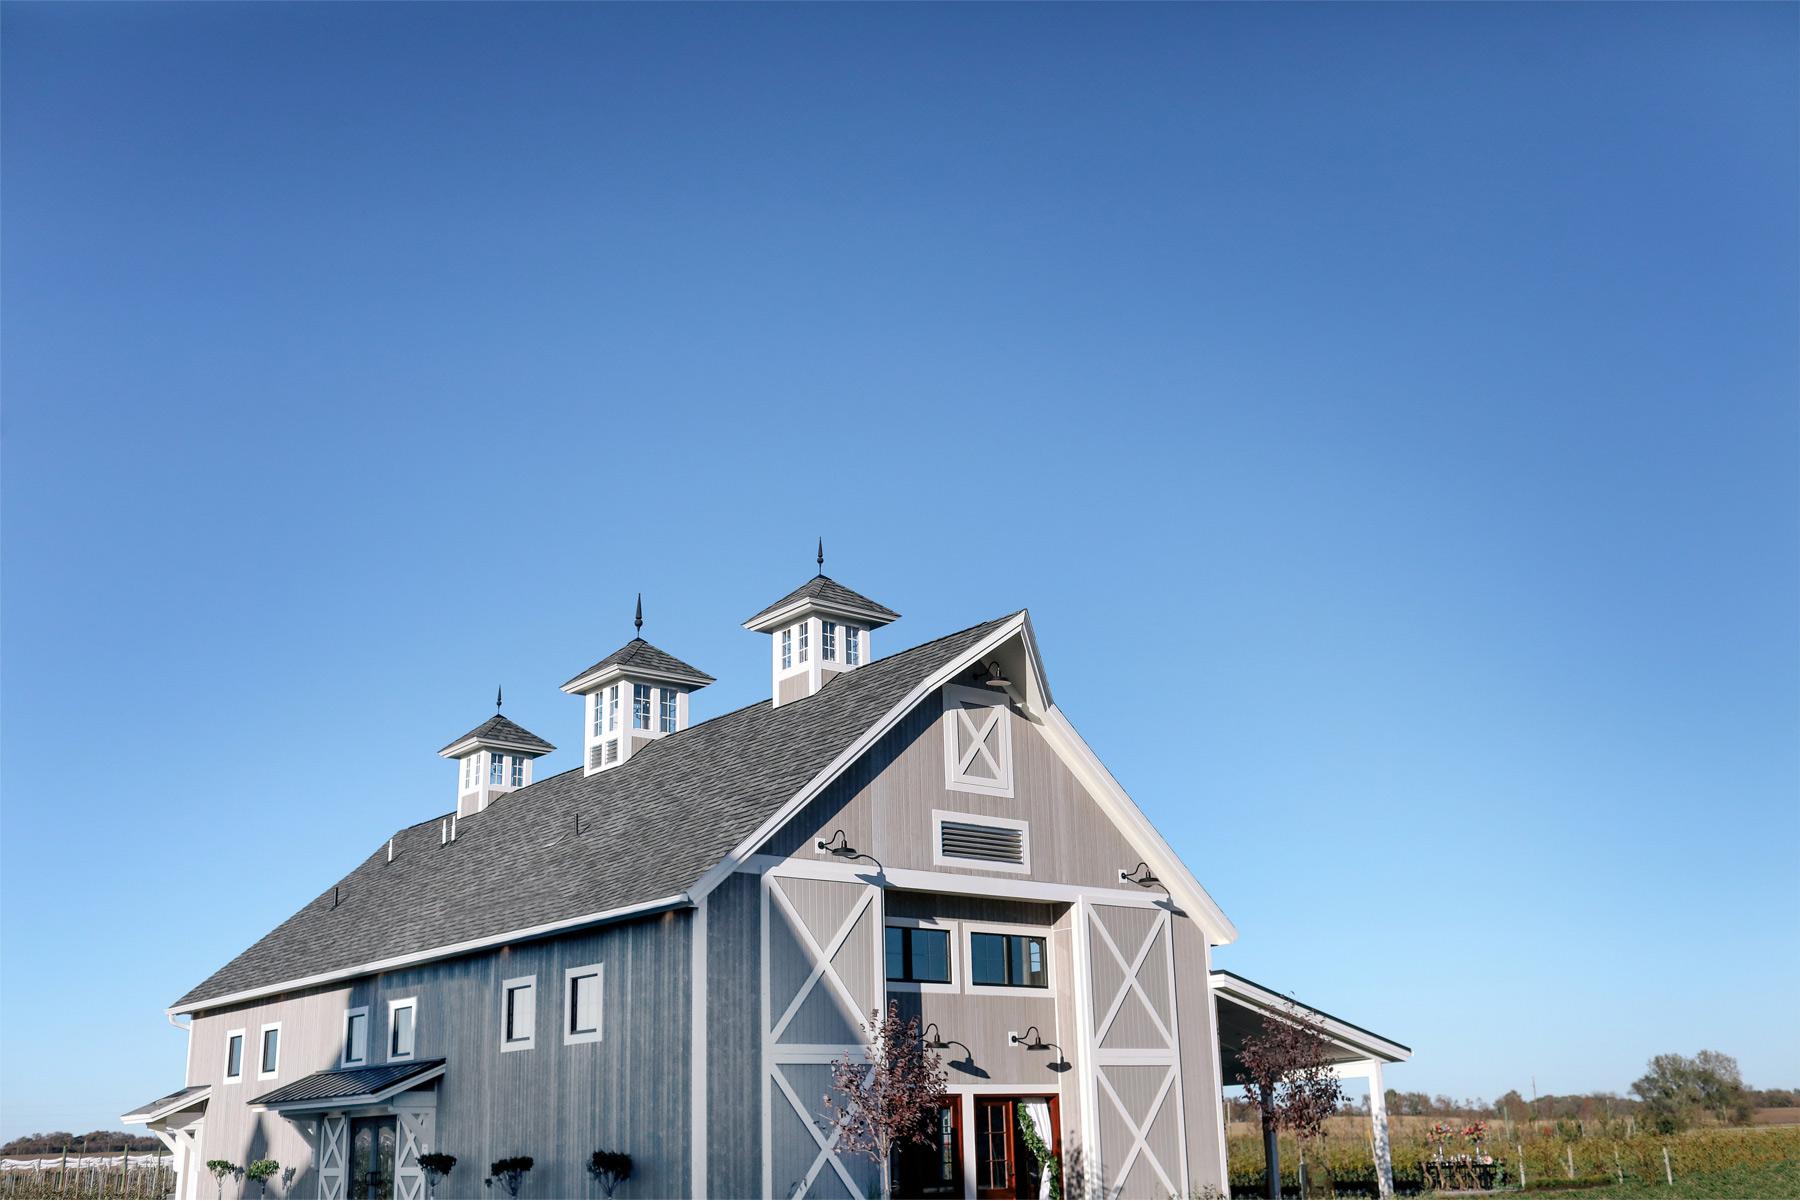 01-Ashery-Lane-Farm-Minneapolis-Minnesota-Wedding-Styled-Shoot-New-Venue-Barn-Orchard-Vineyard.jpg